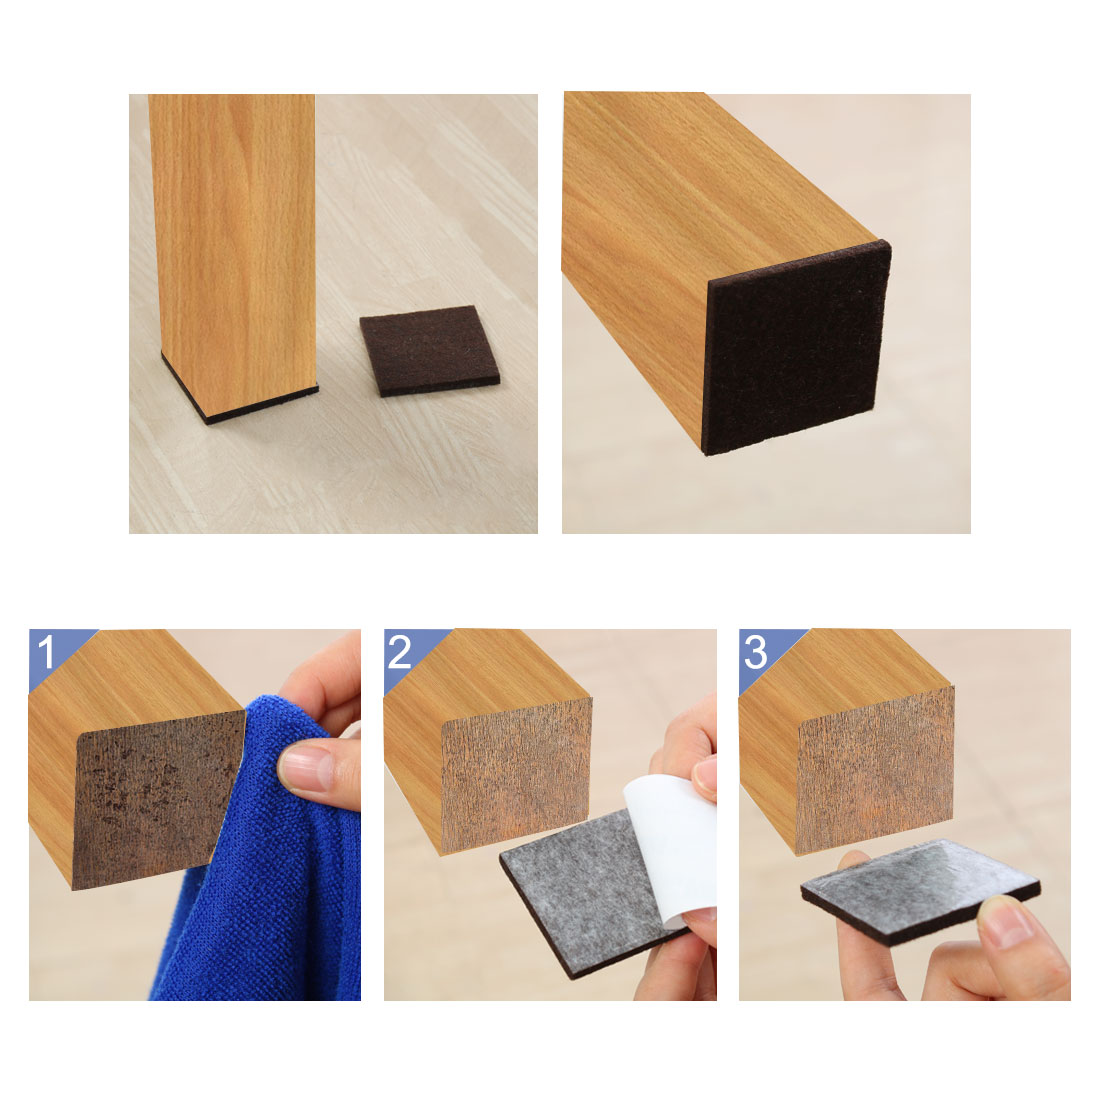 "Felt Furniture Pad Square 1 3/4"" Self Adhesive Anti-scratch Desk Protector 12pcs - image 3 of 7"